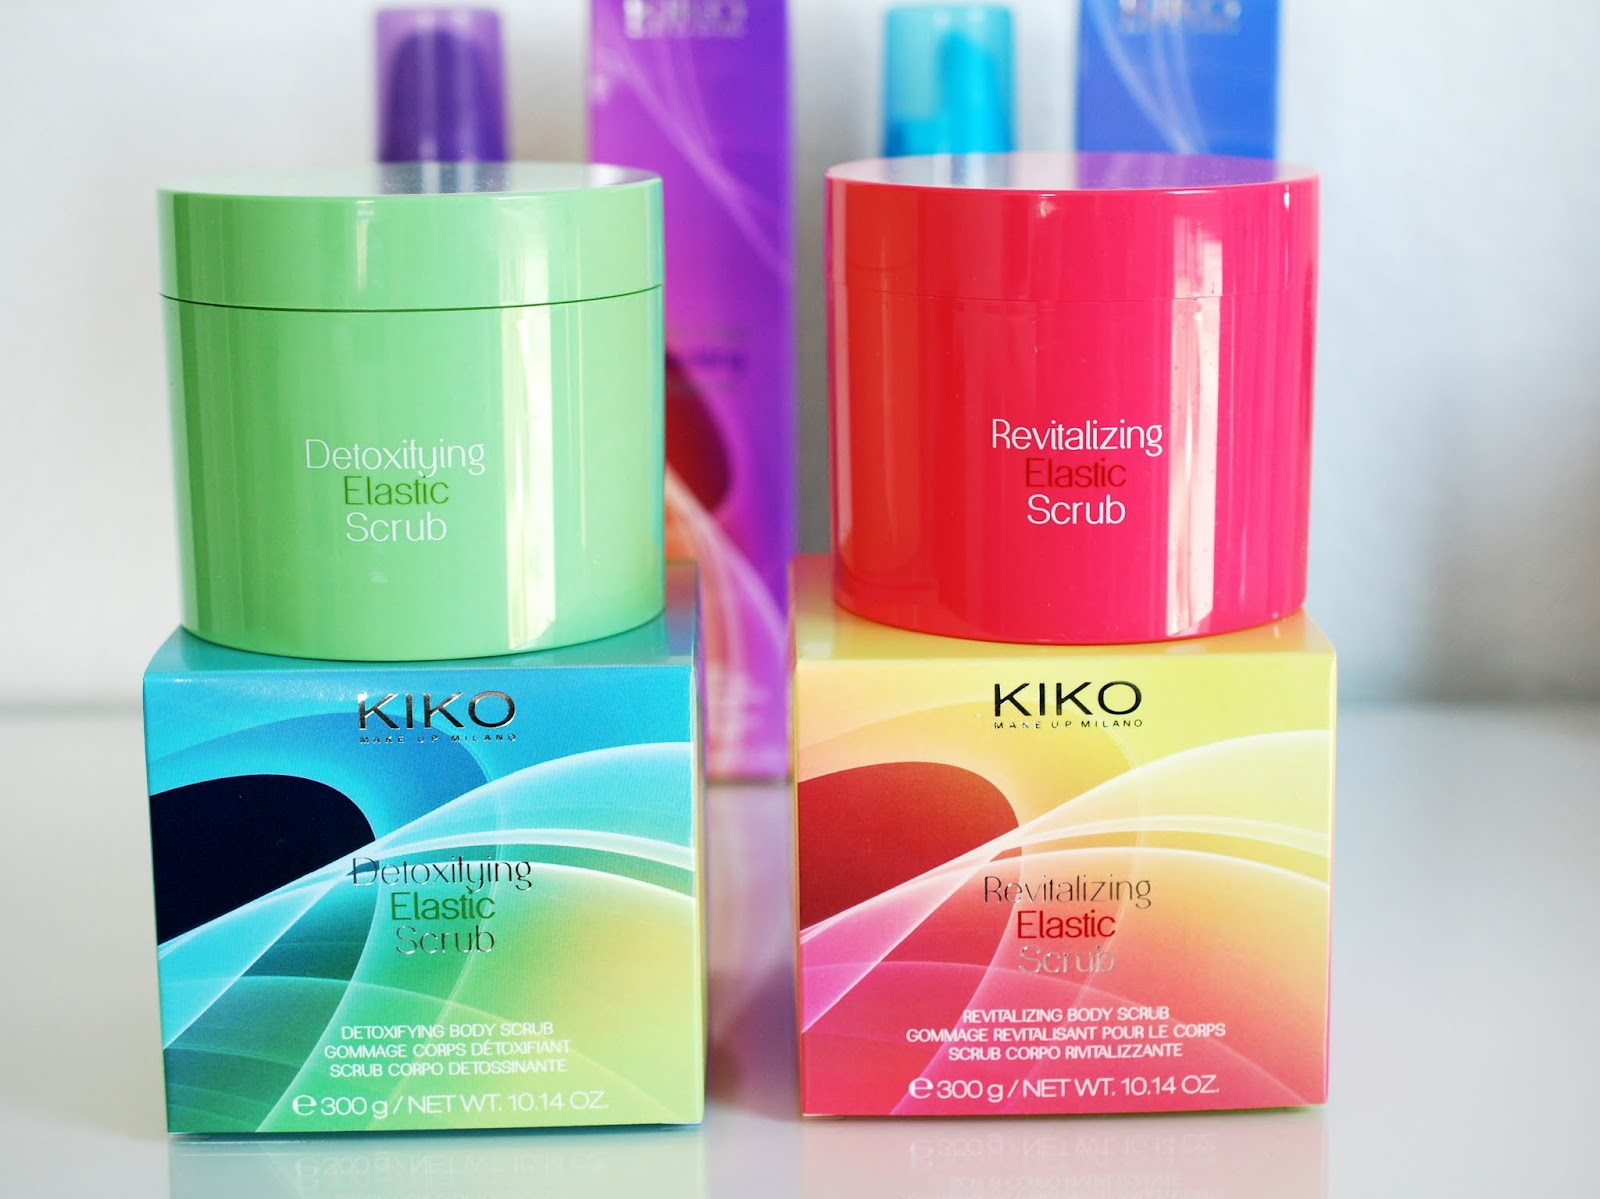 Revitalizing Elastic Scrub und Detoxifying Elastic Scrub Kiko Scented Technology